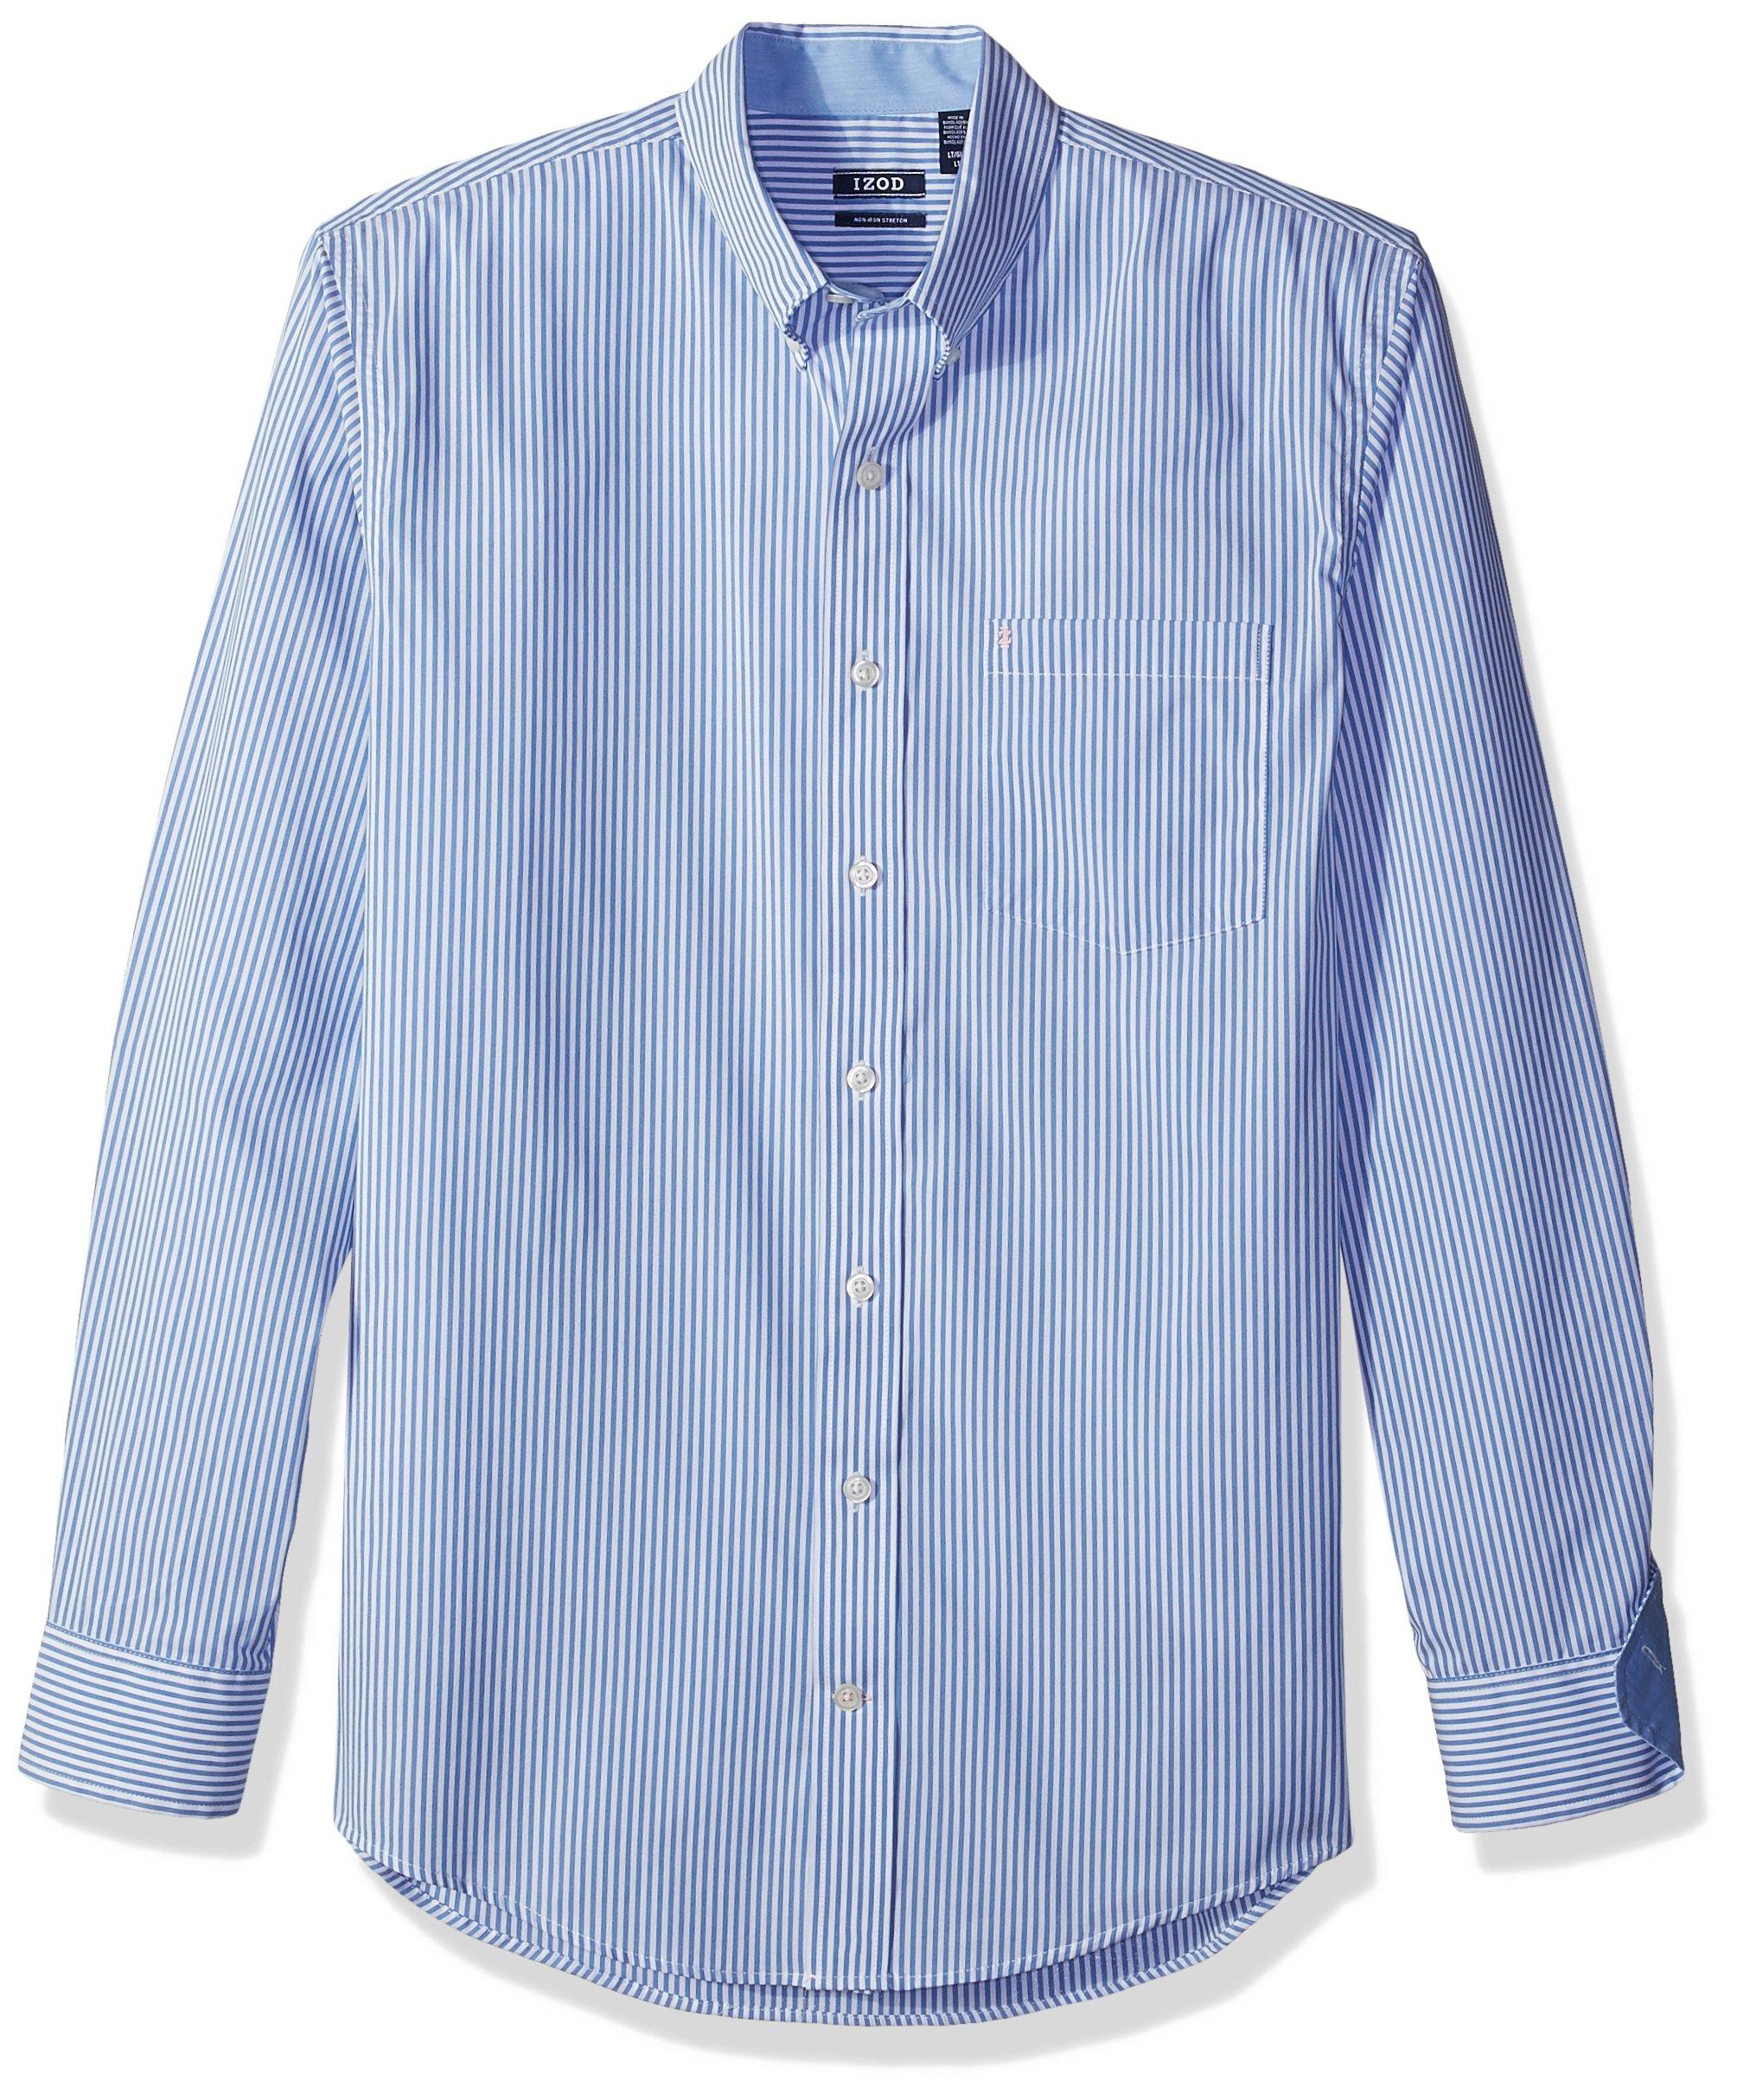 IZOD Men's Big and Tall Advantage Performance Stretch Long Sleeve Shirt, Vivid Mazarine Blue, 2X-Large Big